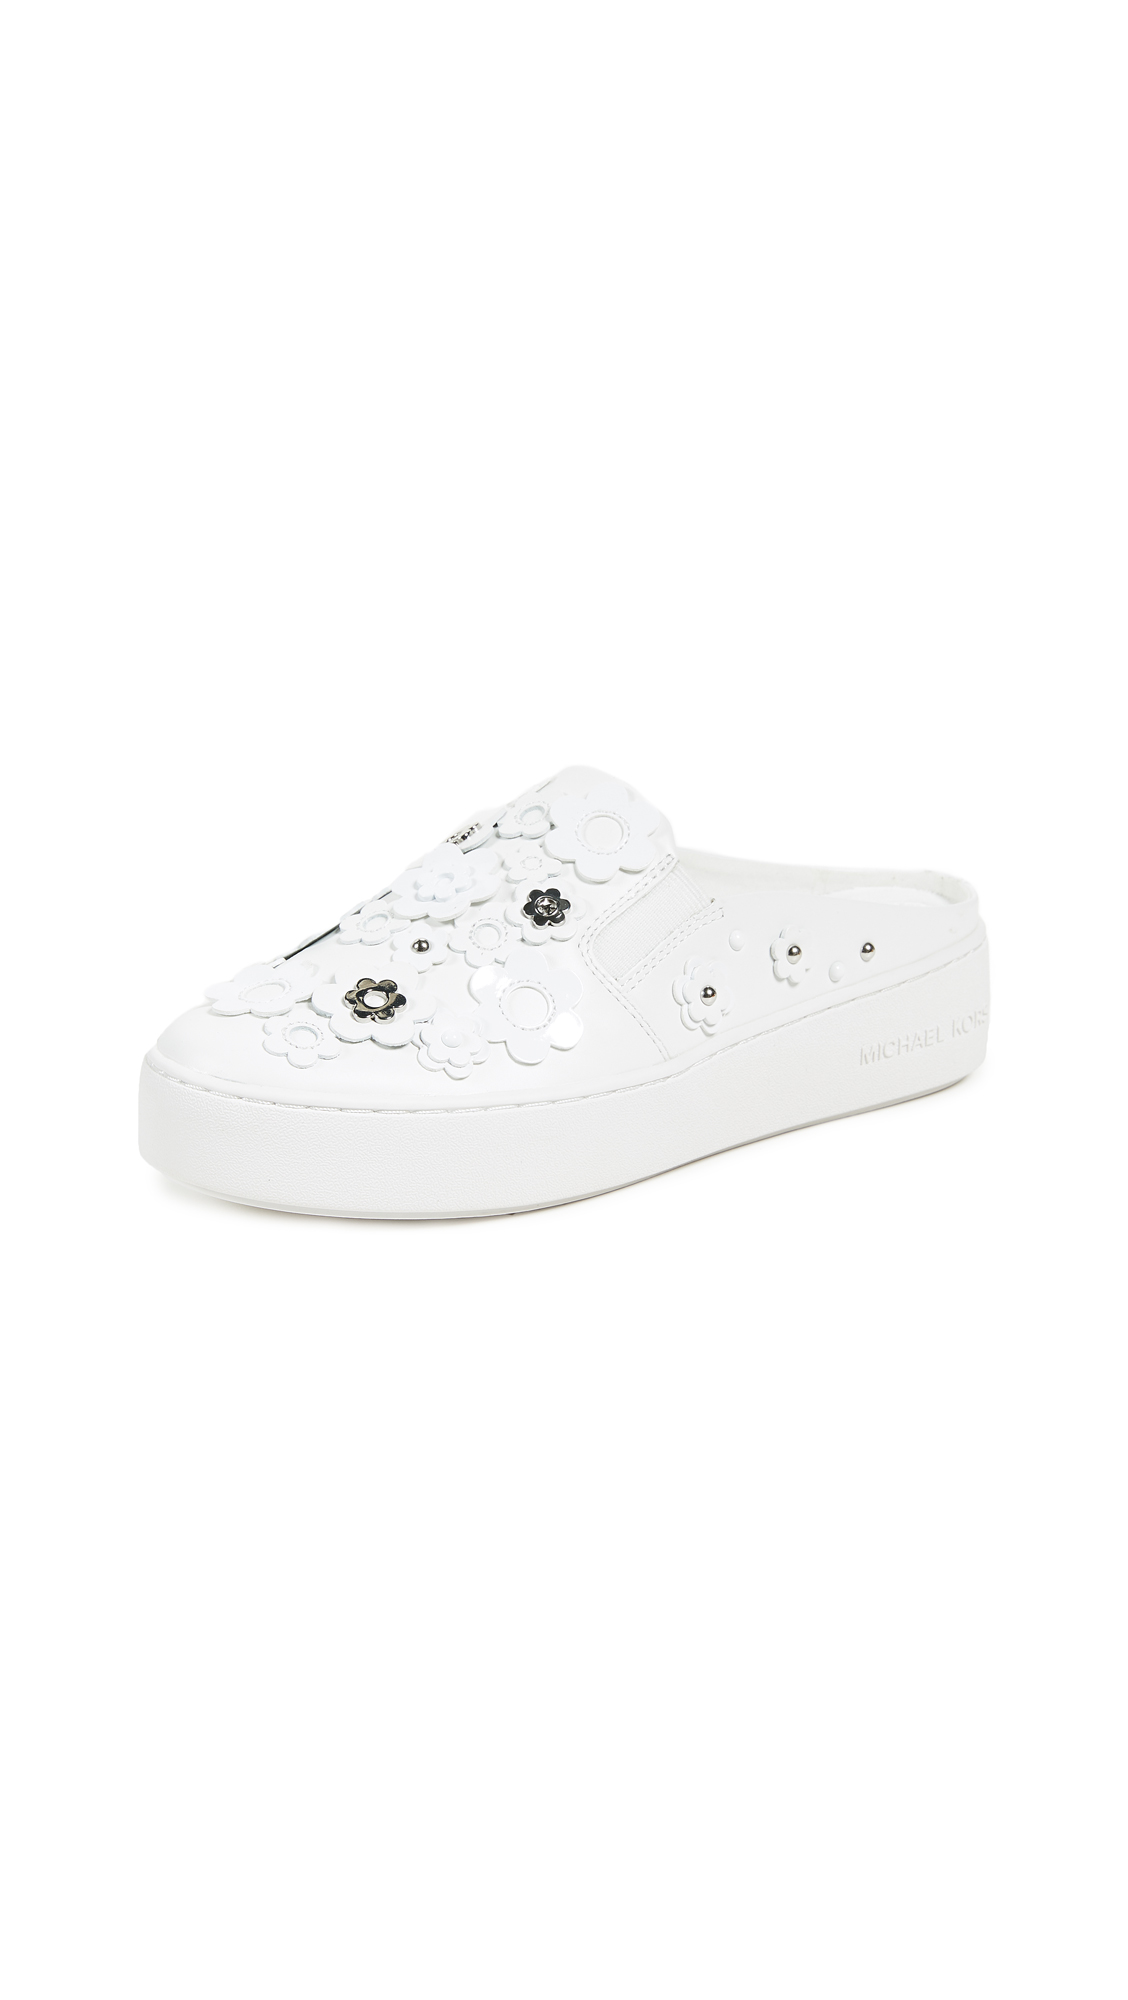 MICHAEL Michael Kors Vanna Slip On Sneakers - Optic White